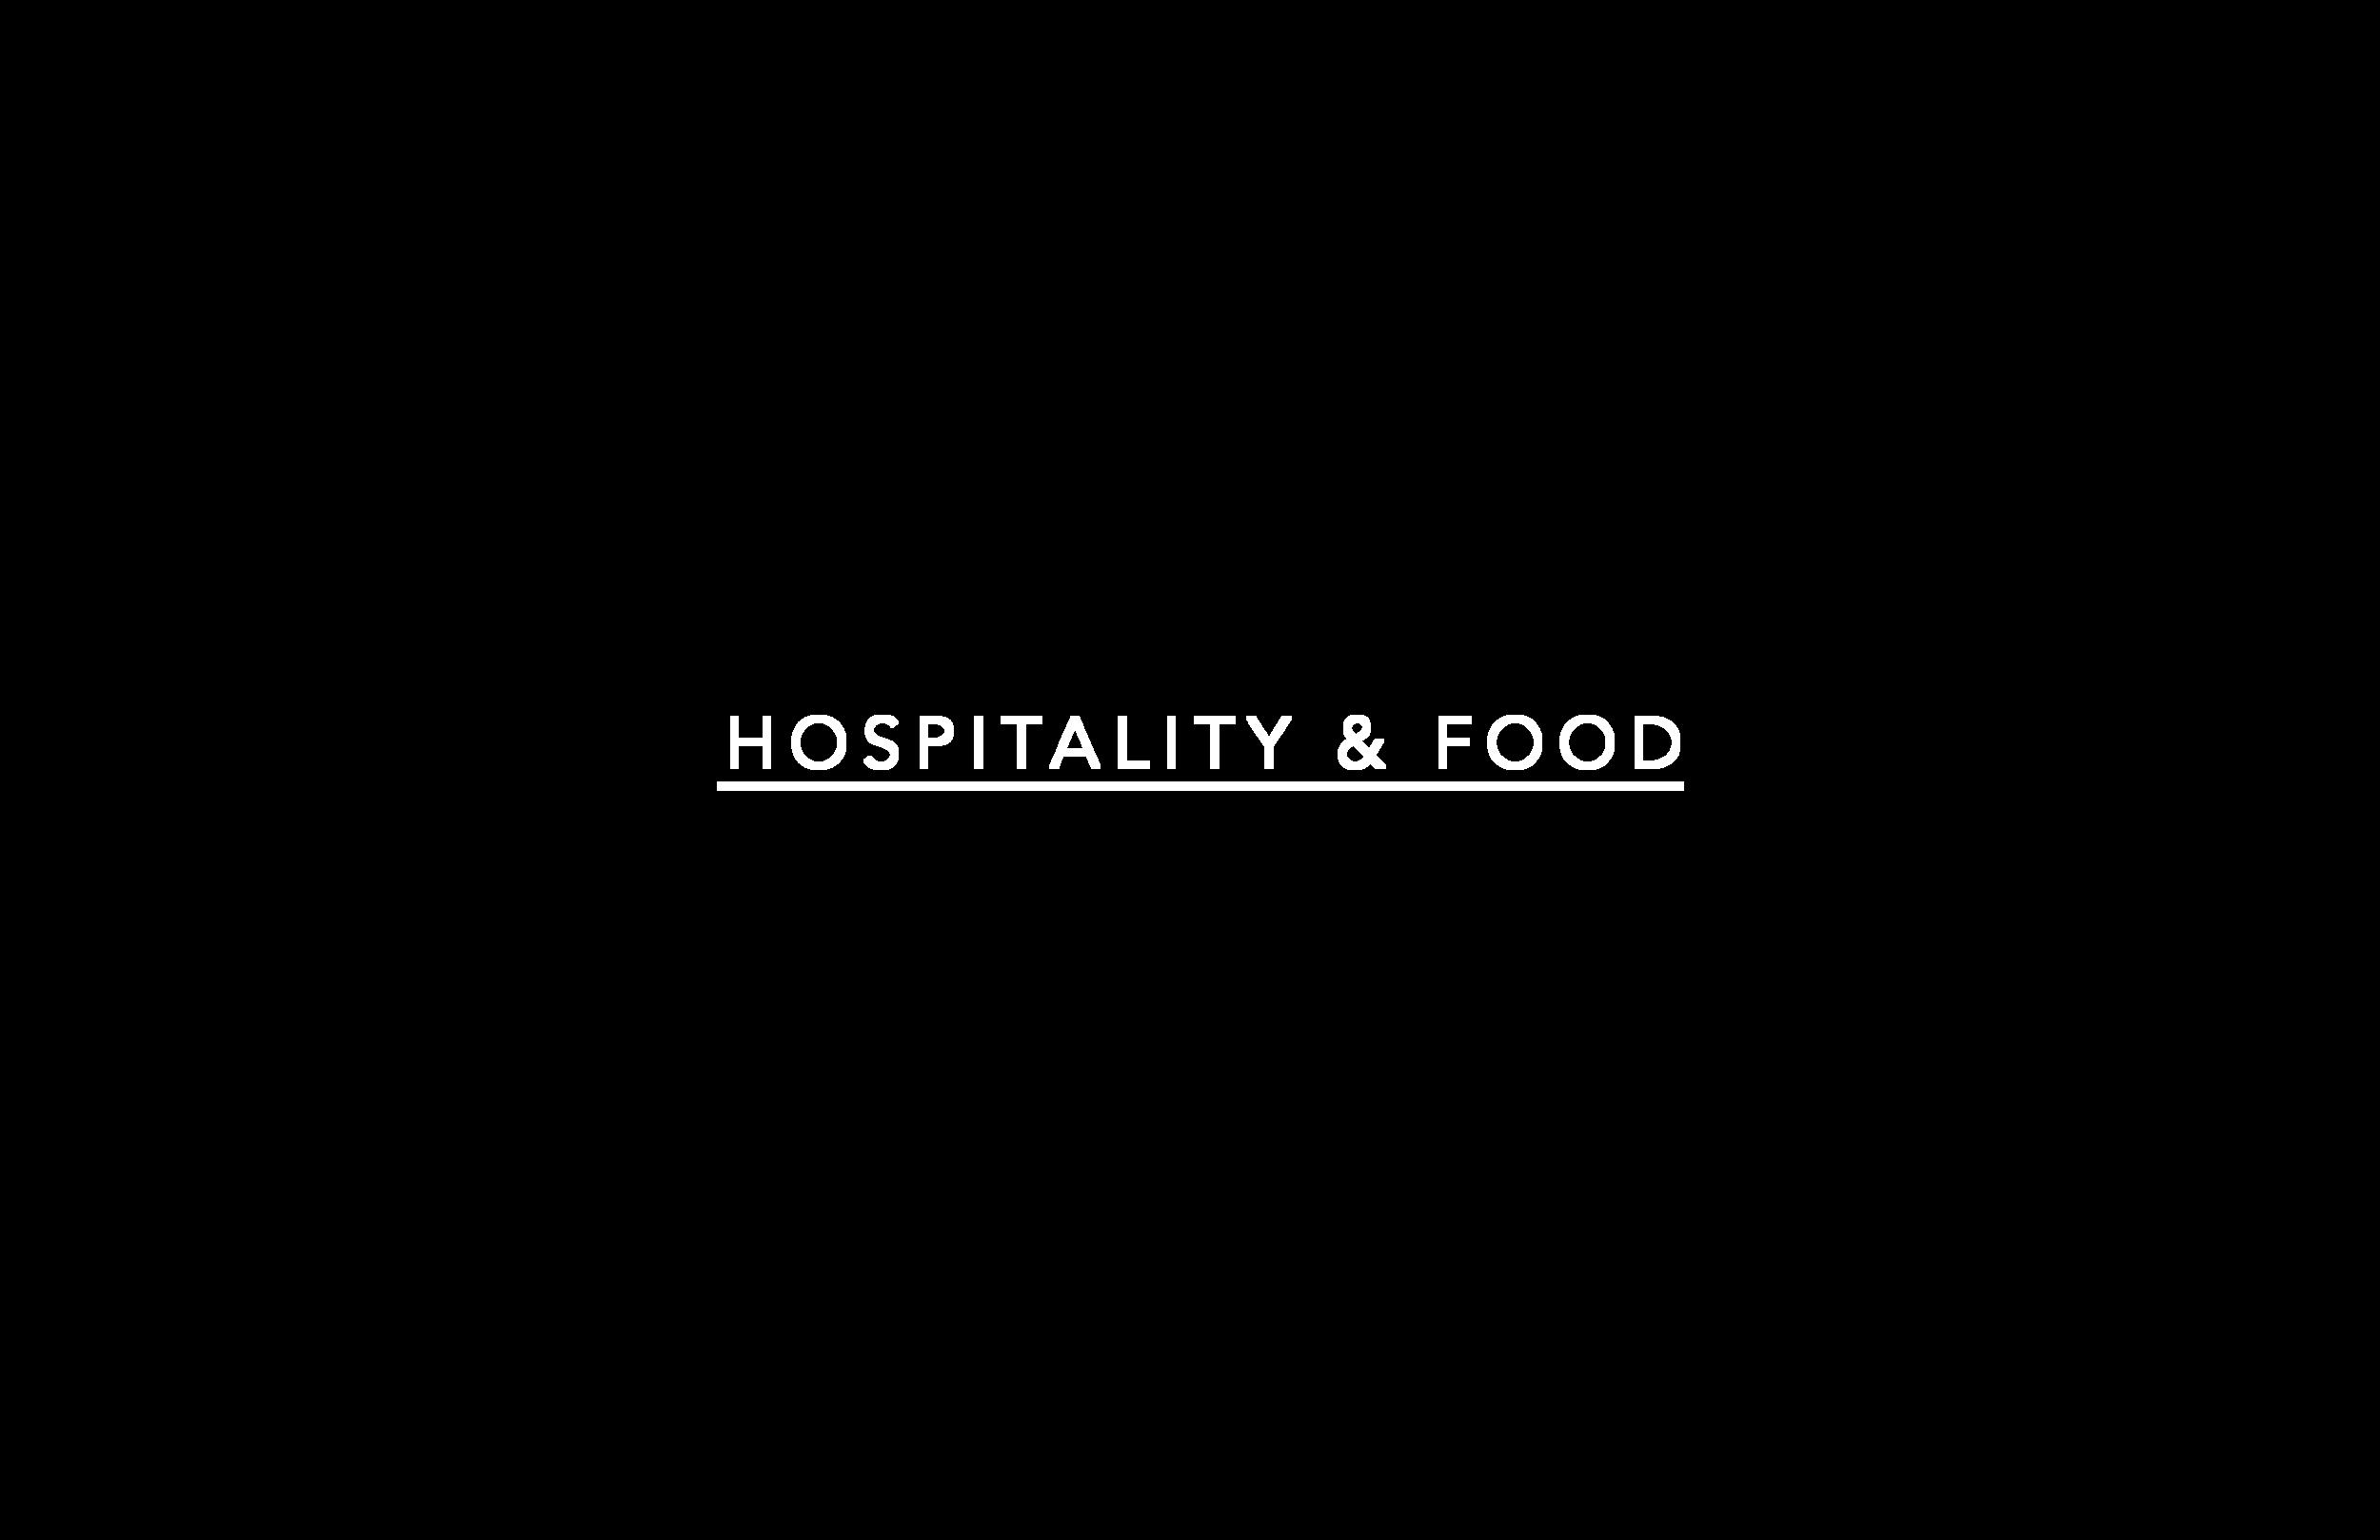 HOSPITALITYANDFOOD.png